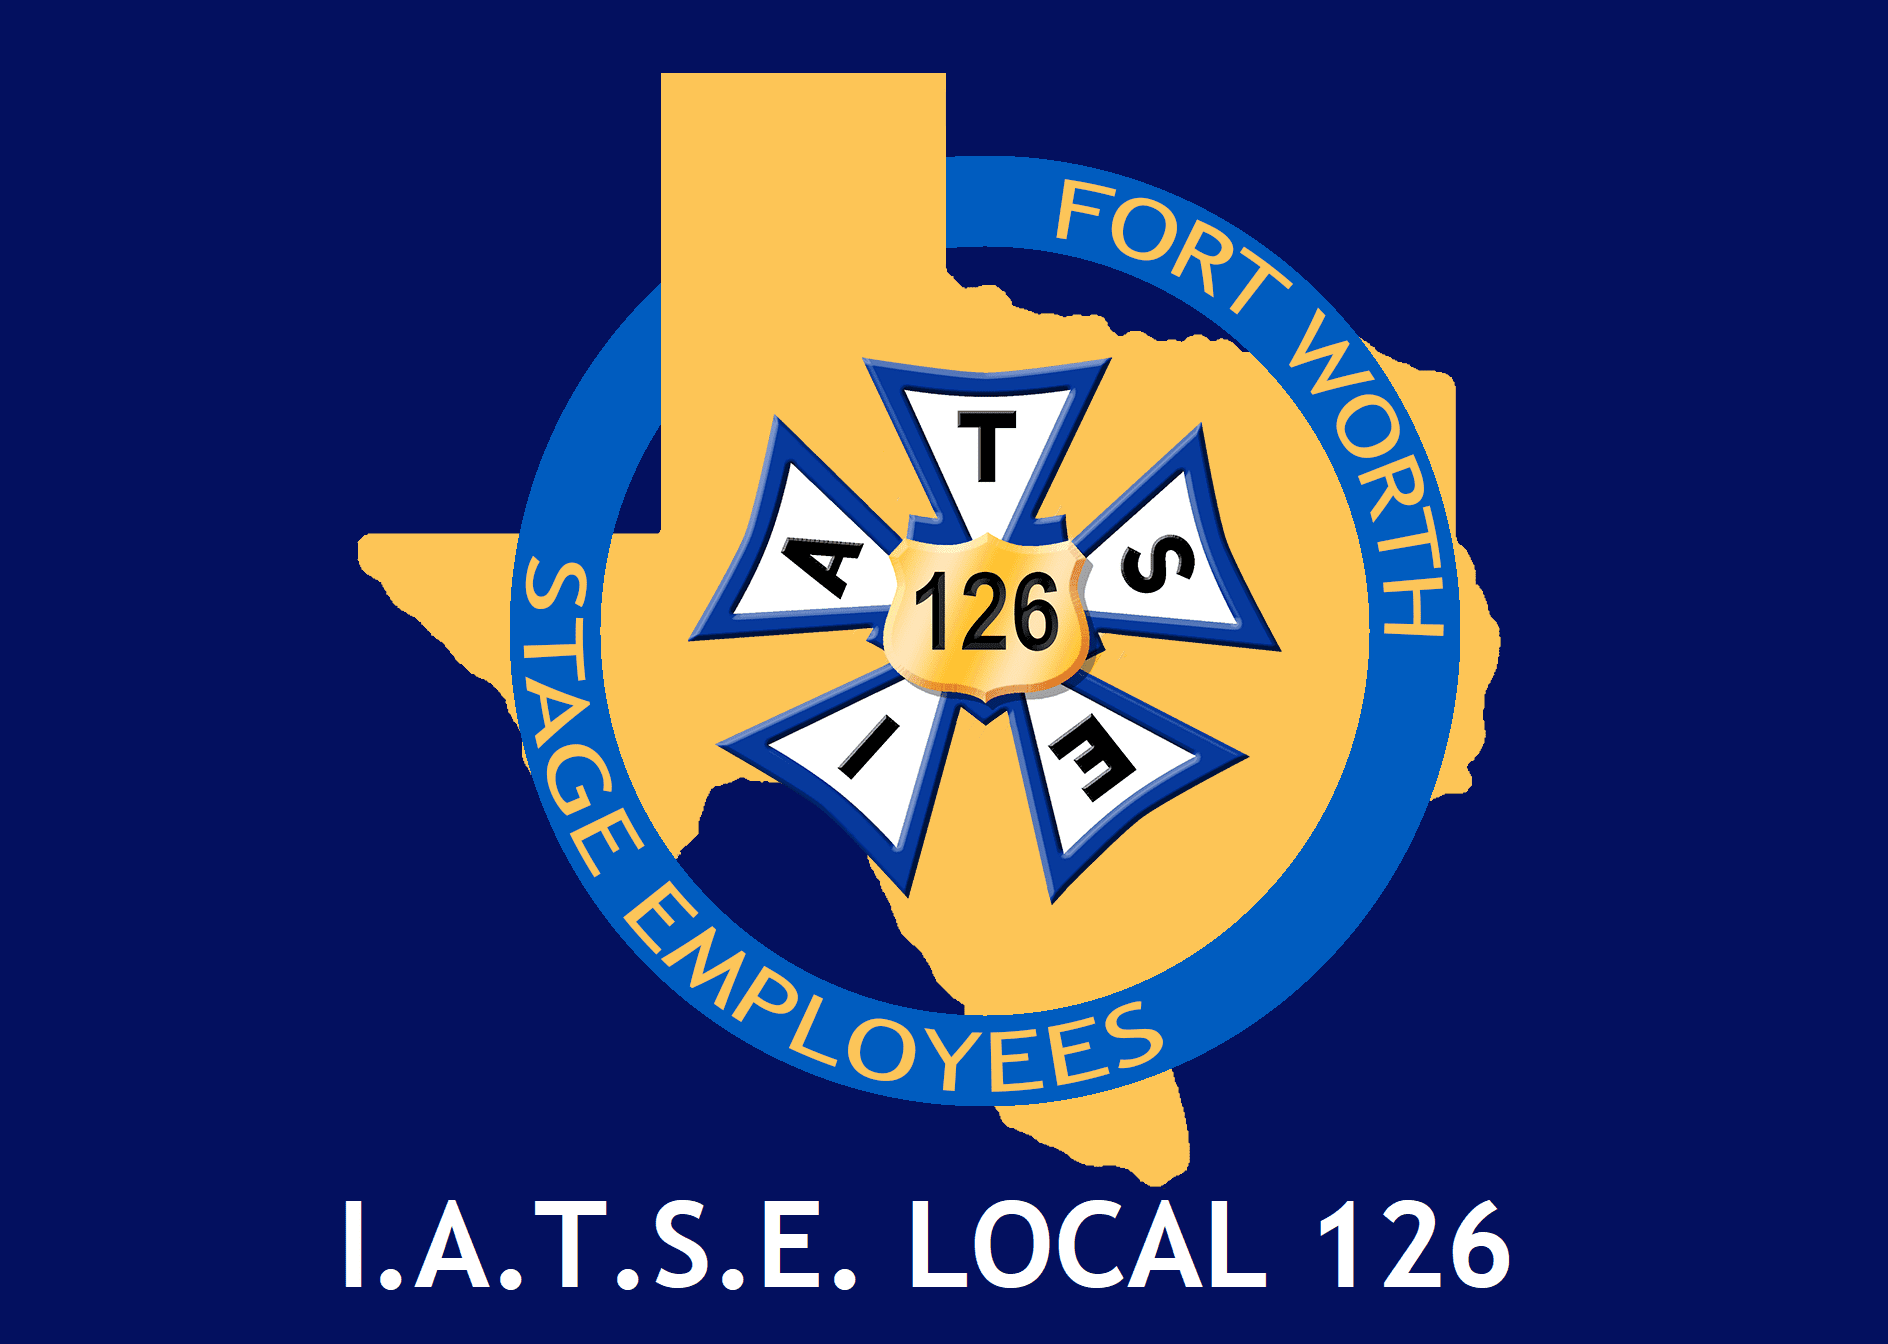 eb1f6644-7d0c-4818-abd9-7178cfcc9265126 web logo